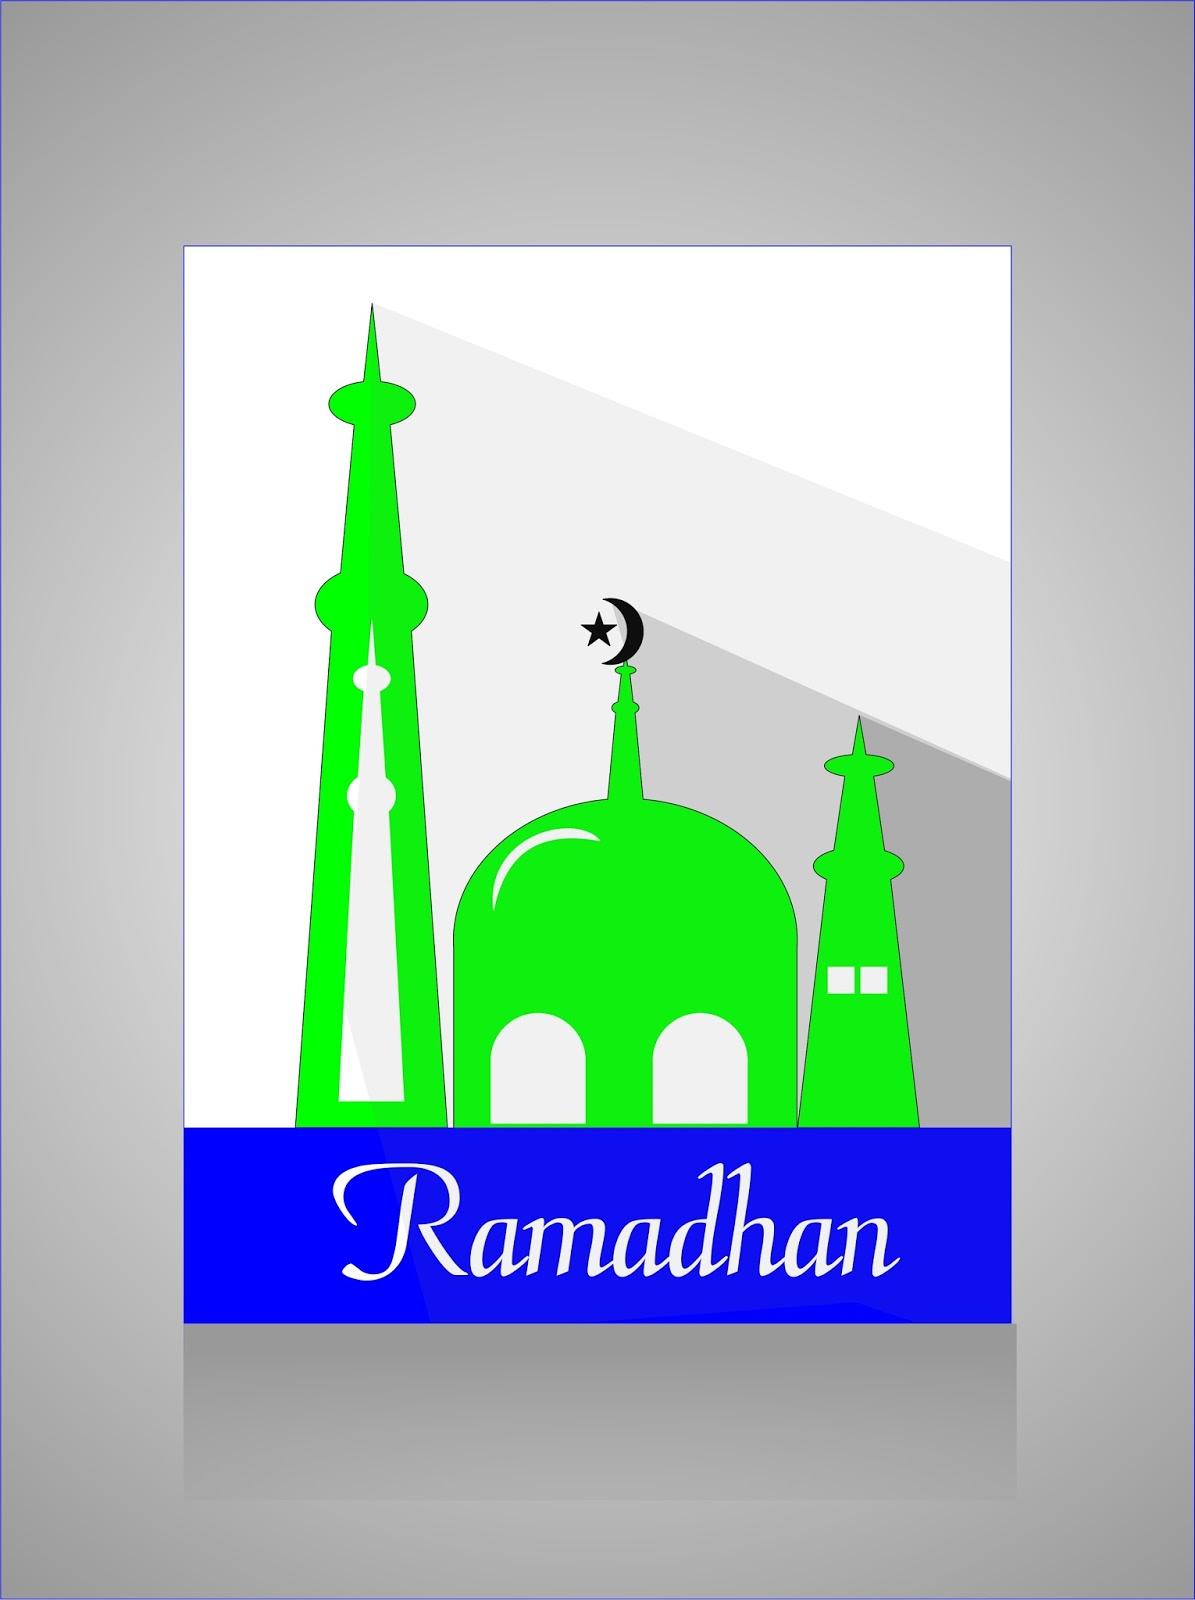 cara membuat Masjid dengan Corel Draw mudah dan cepat